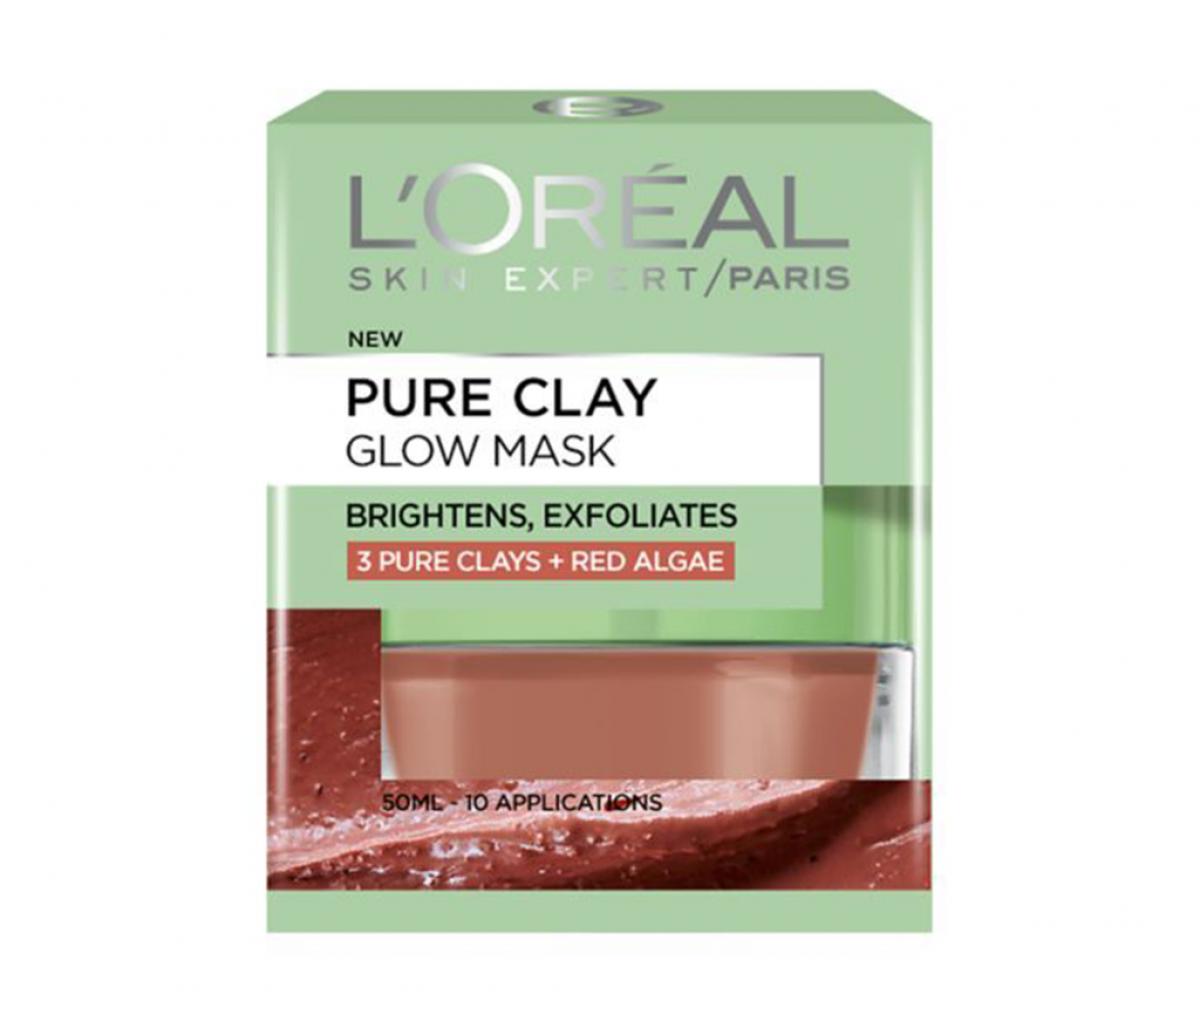 L'Oreal  Pure Clay Glow Mask (English)